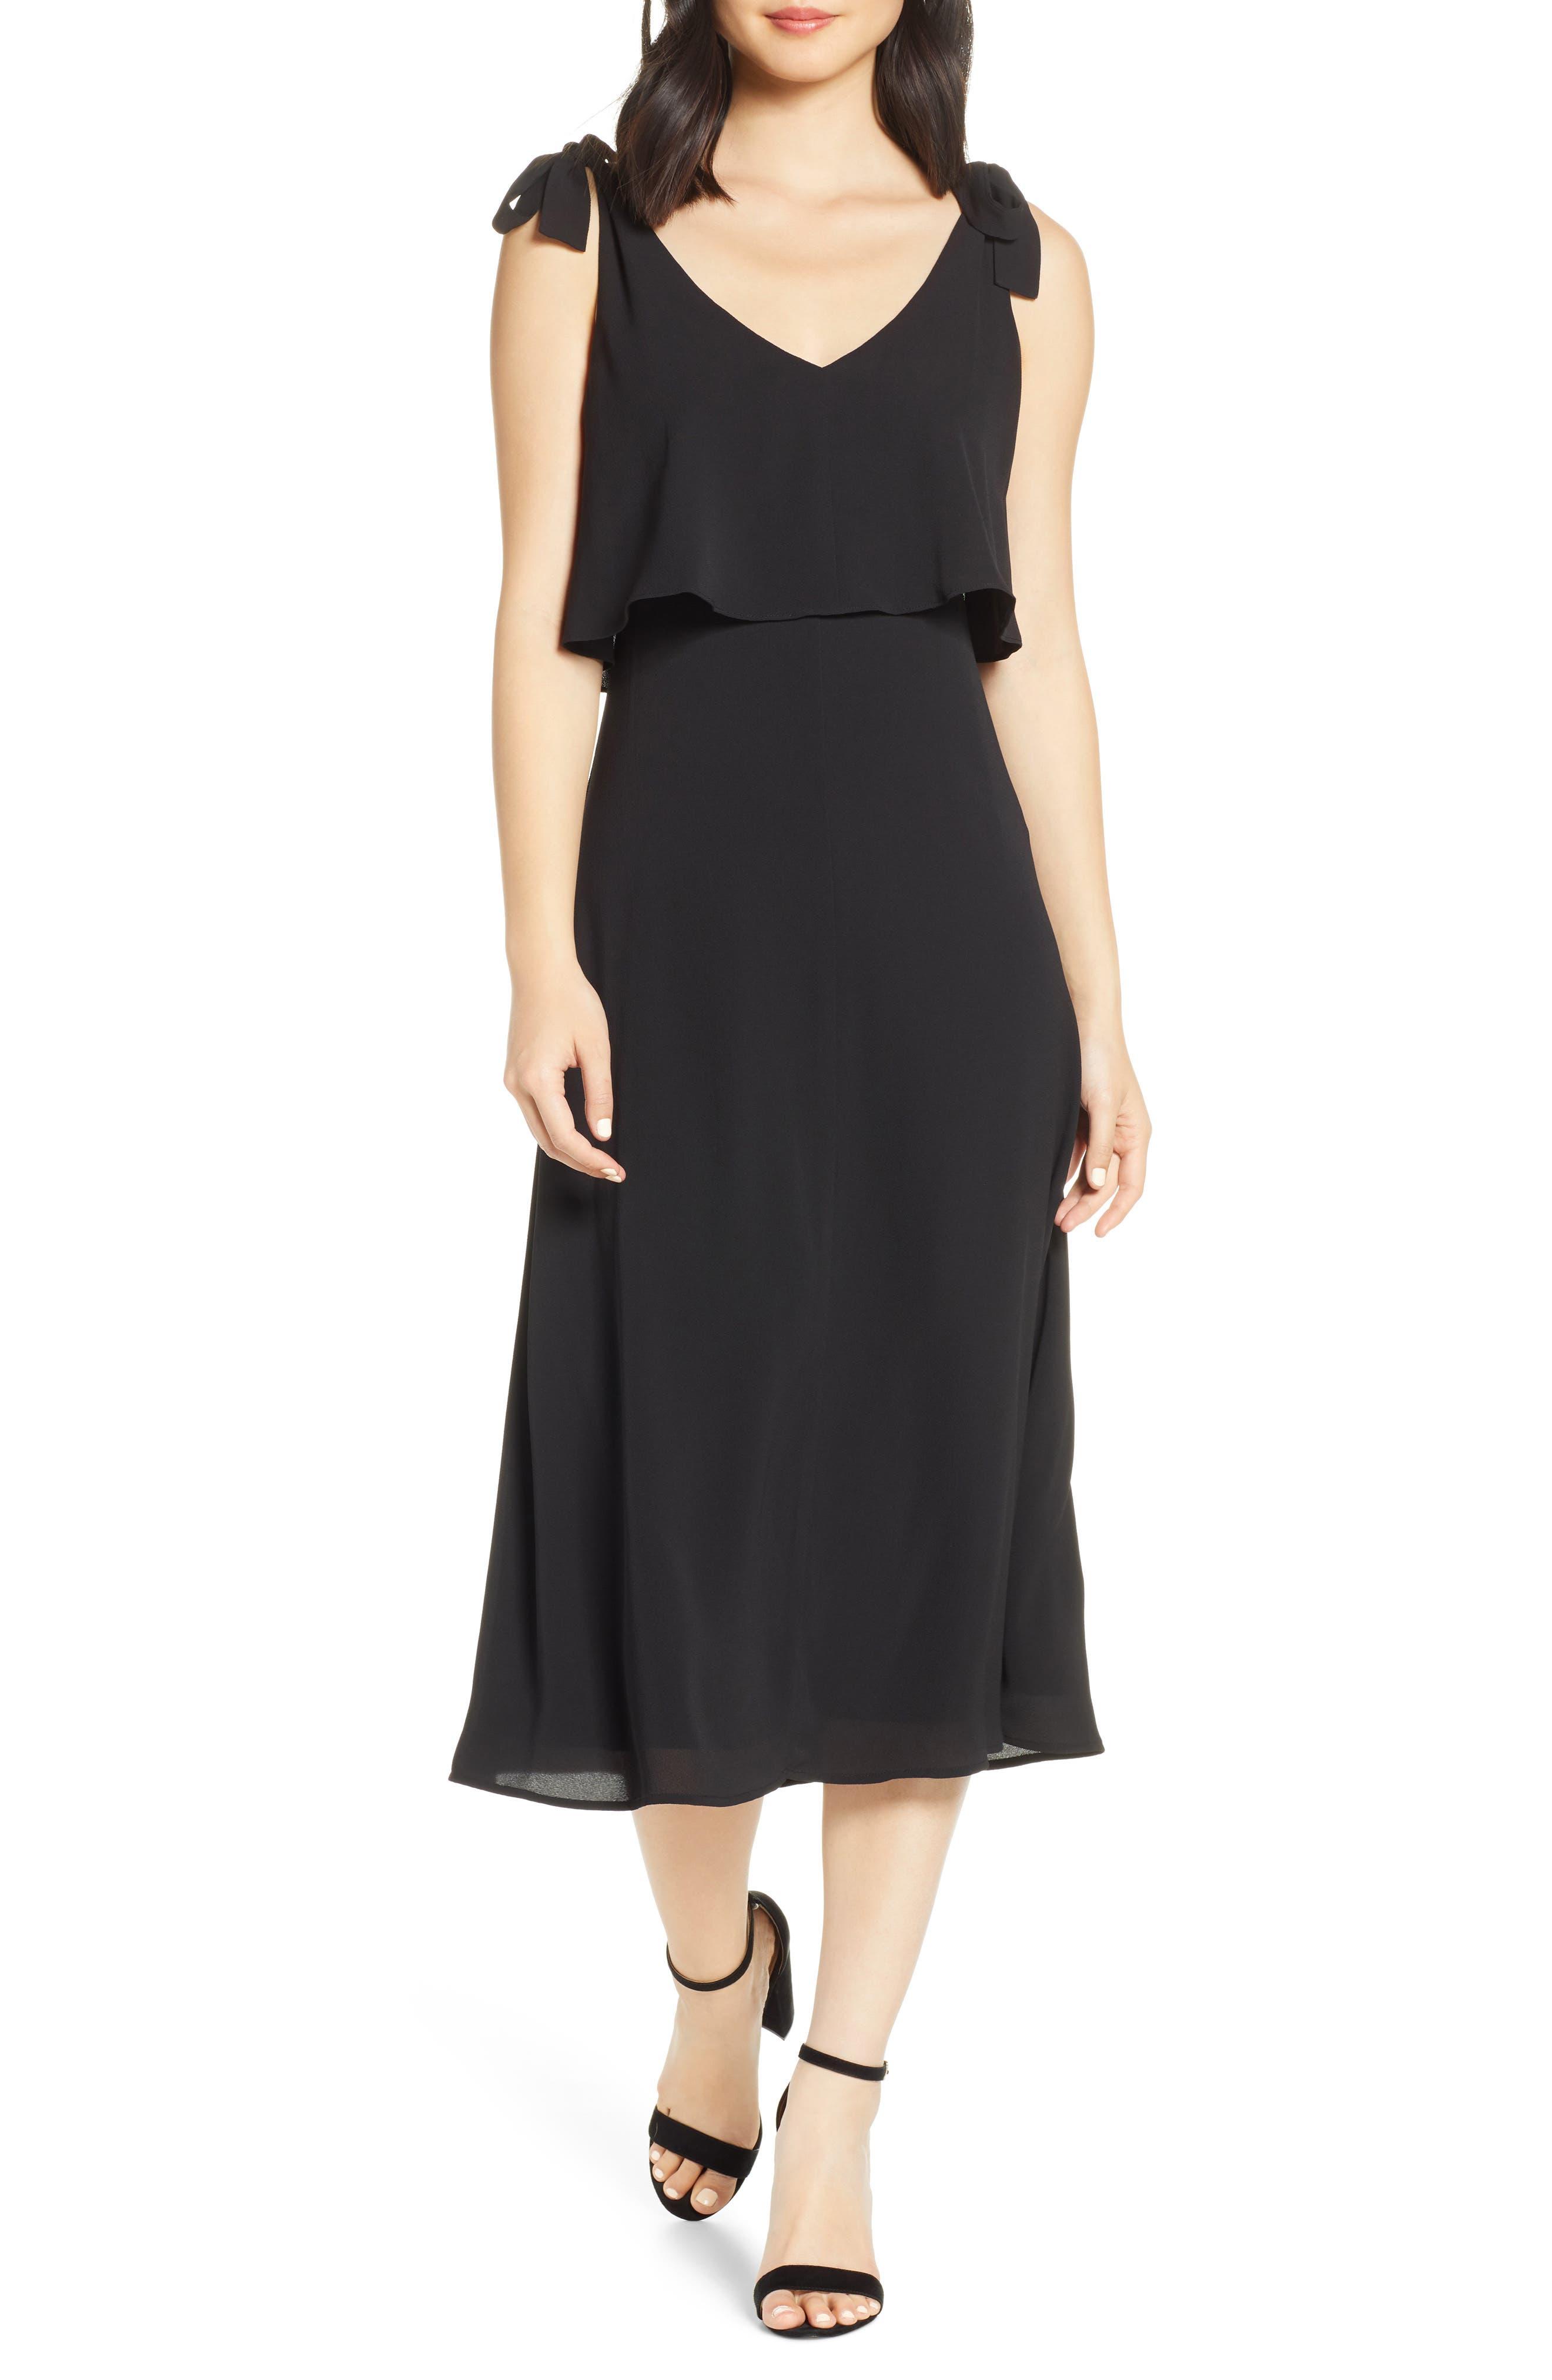 CHARLES HENRY, Tie Shoulder Popover Midi Dress, Main thumbnail 1, color, BLACK